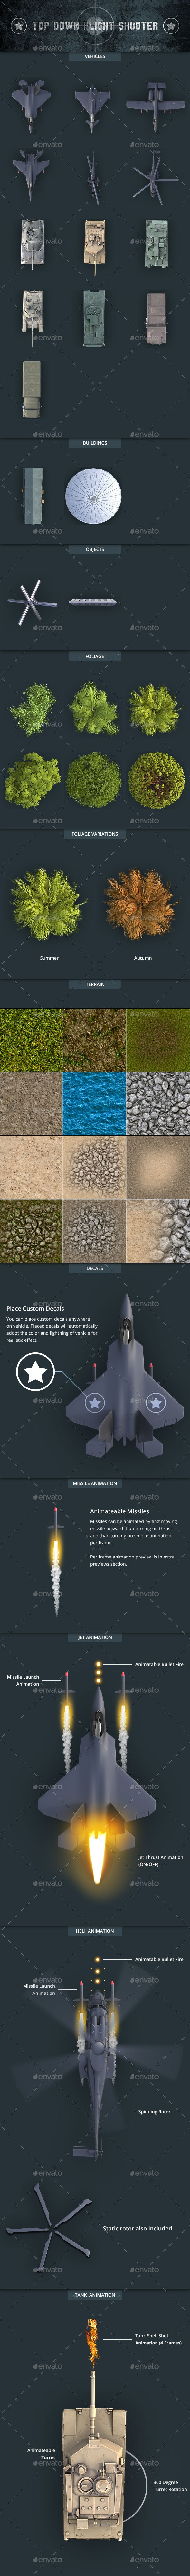 Top Down Flight Shooter Game Kit - Game Kits Game Assets